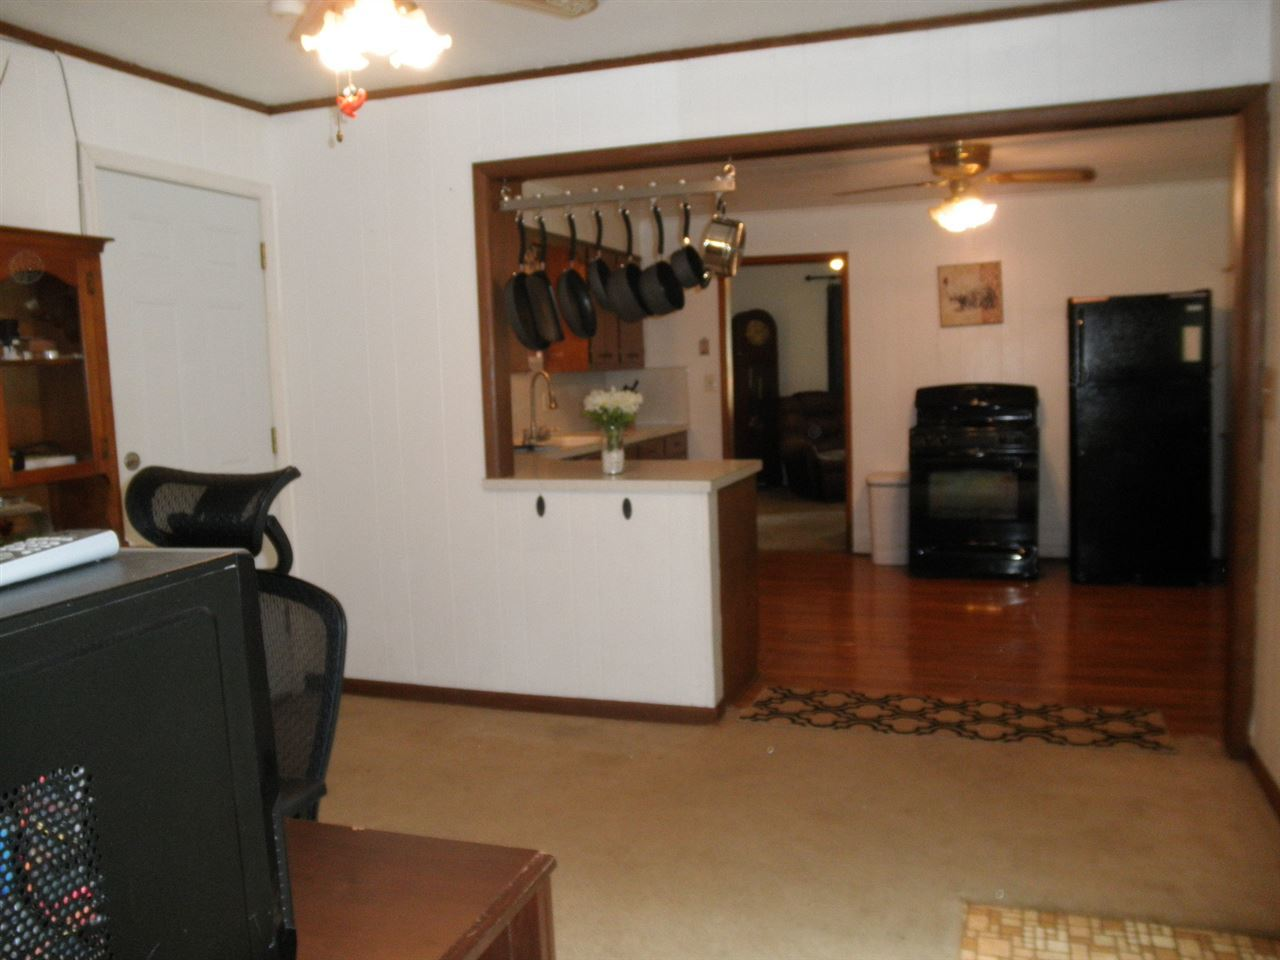 Sold Cross Sale W/ MLS | 808 Gray  Ponca City, OK 74604 3